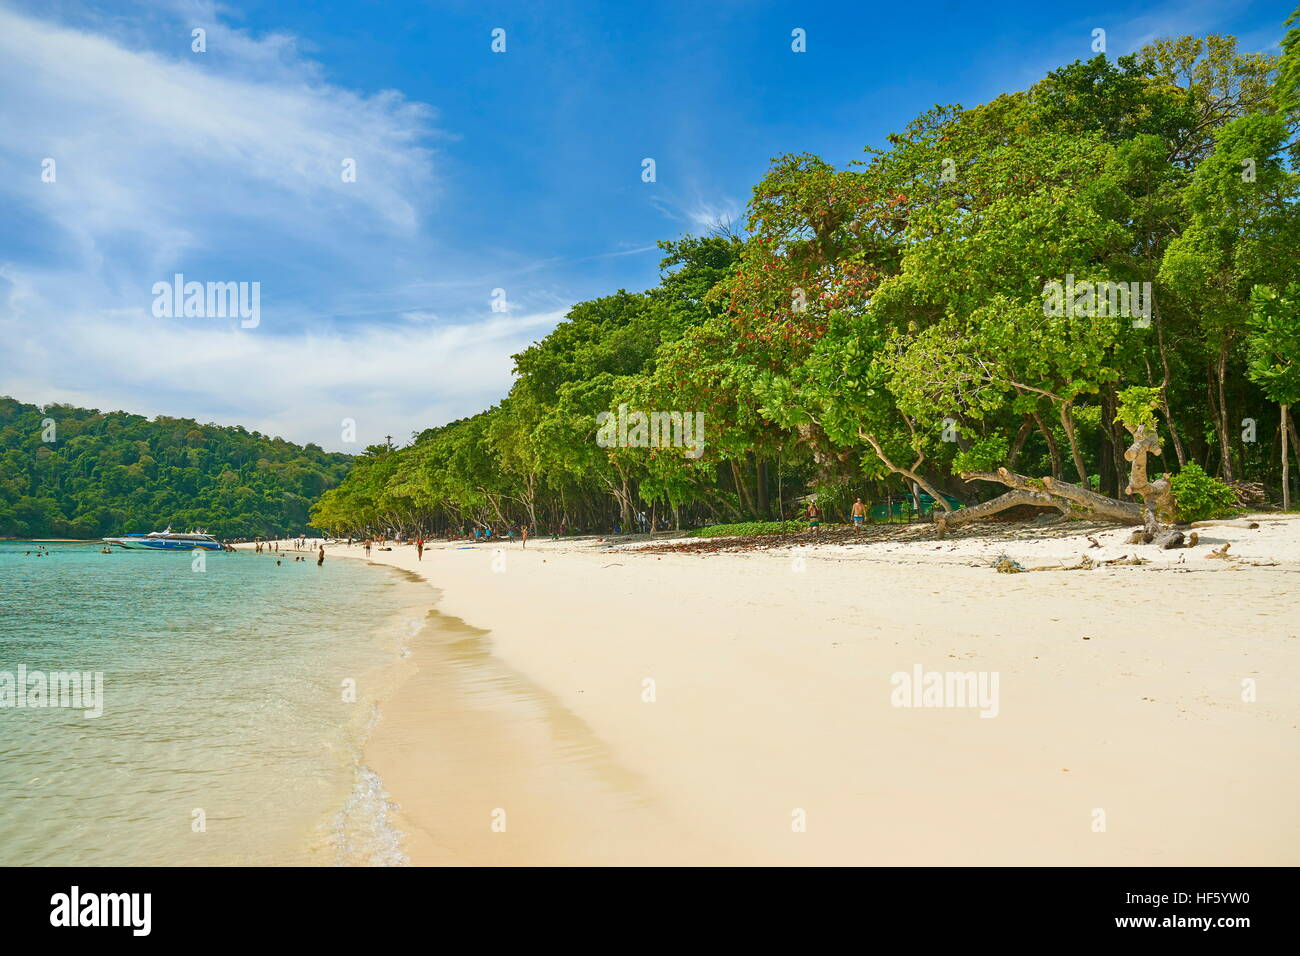 Beach of Koh Rok Island, Krabi Province, Thailand - Stock Image